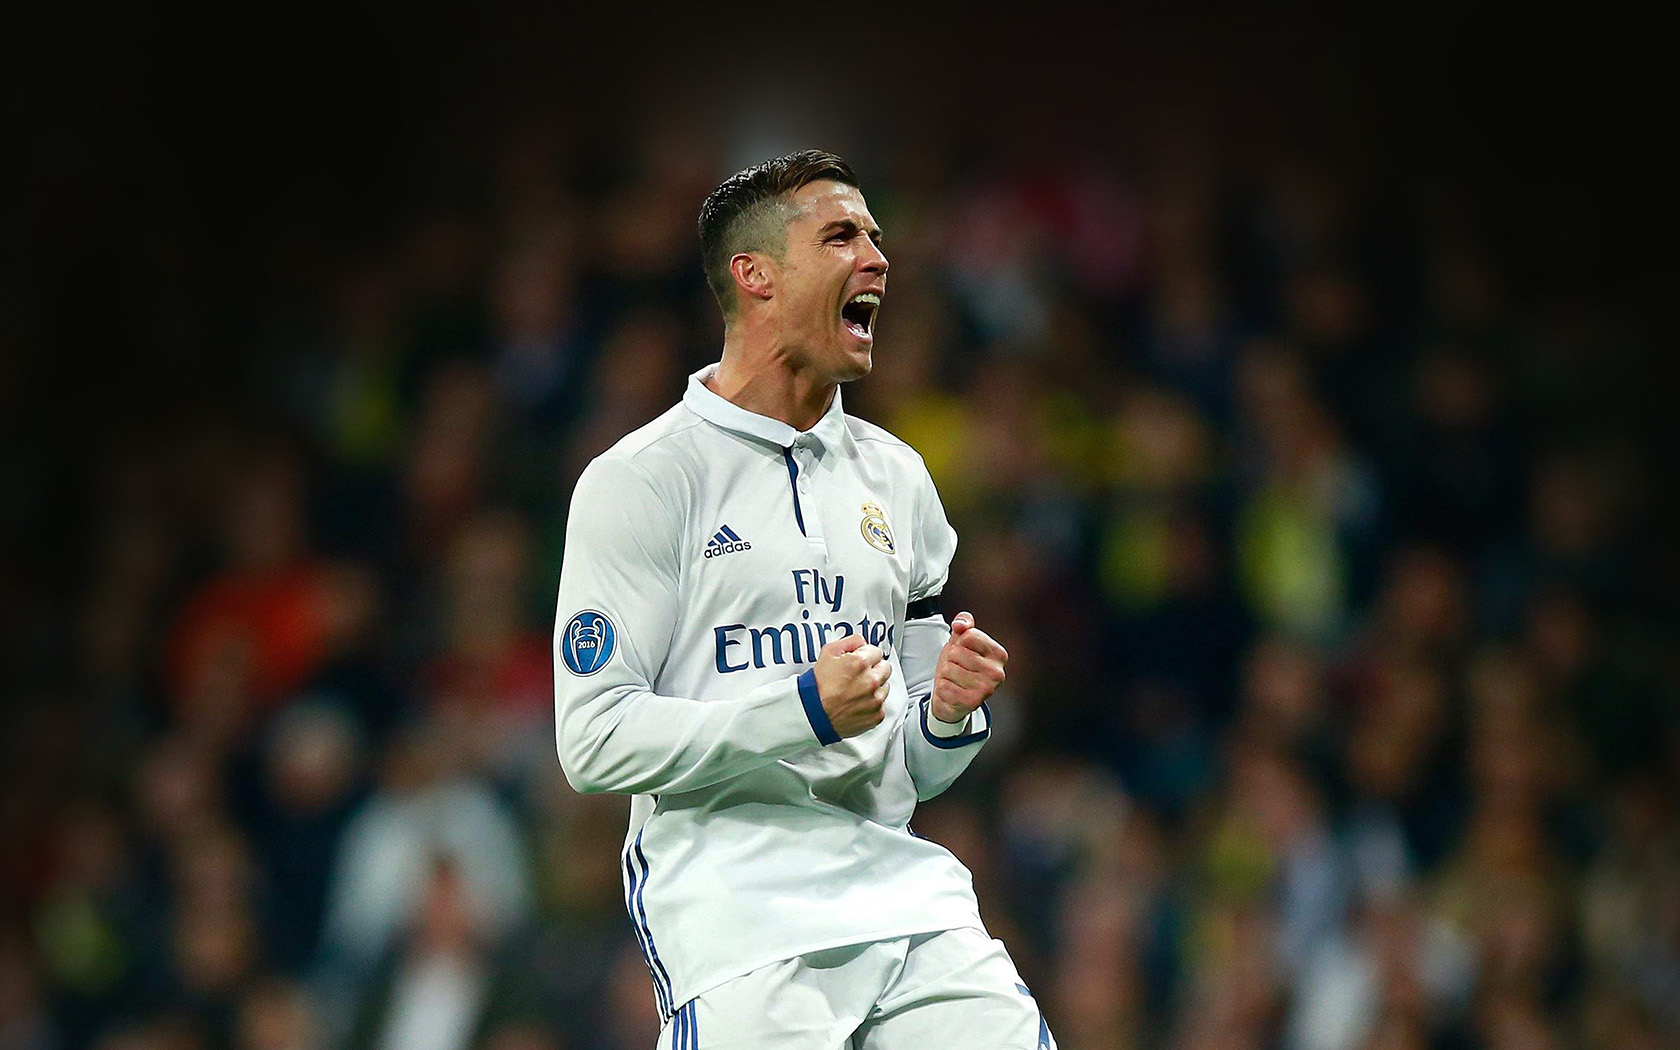 4k Fall Mountain Wallpaper Hm22 C Ronaldo Soccer Real Madrid Sports Wallpaper